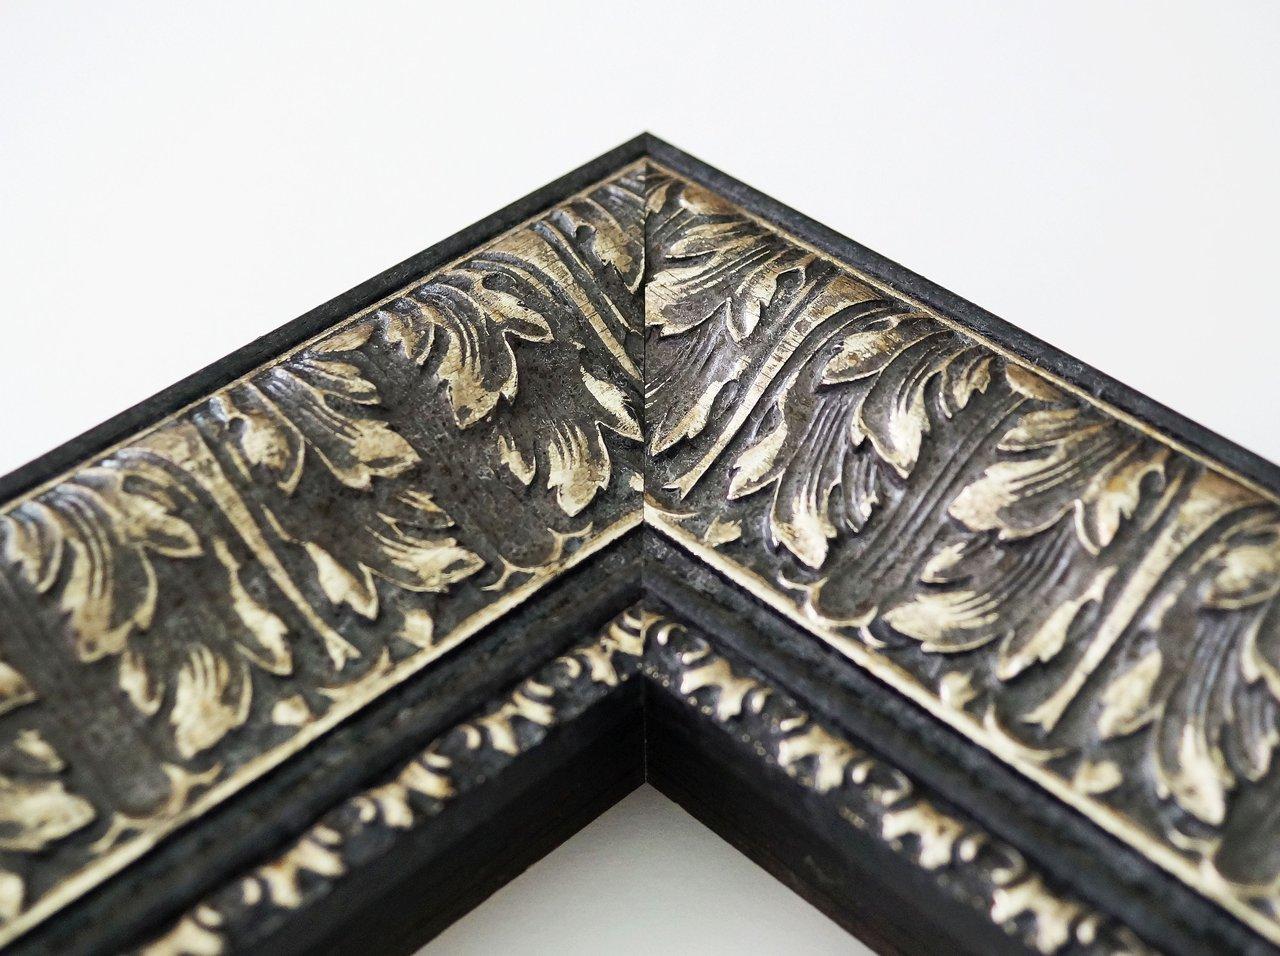 Flurspiegel Schwarz Silber Ancona Barock 7,5 alle Größen